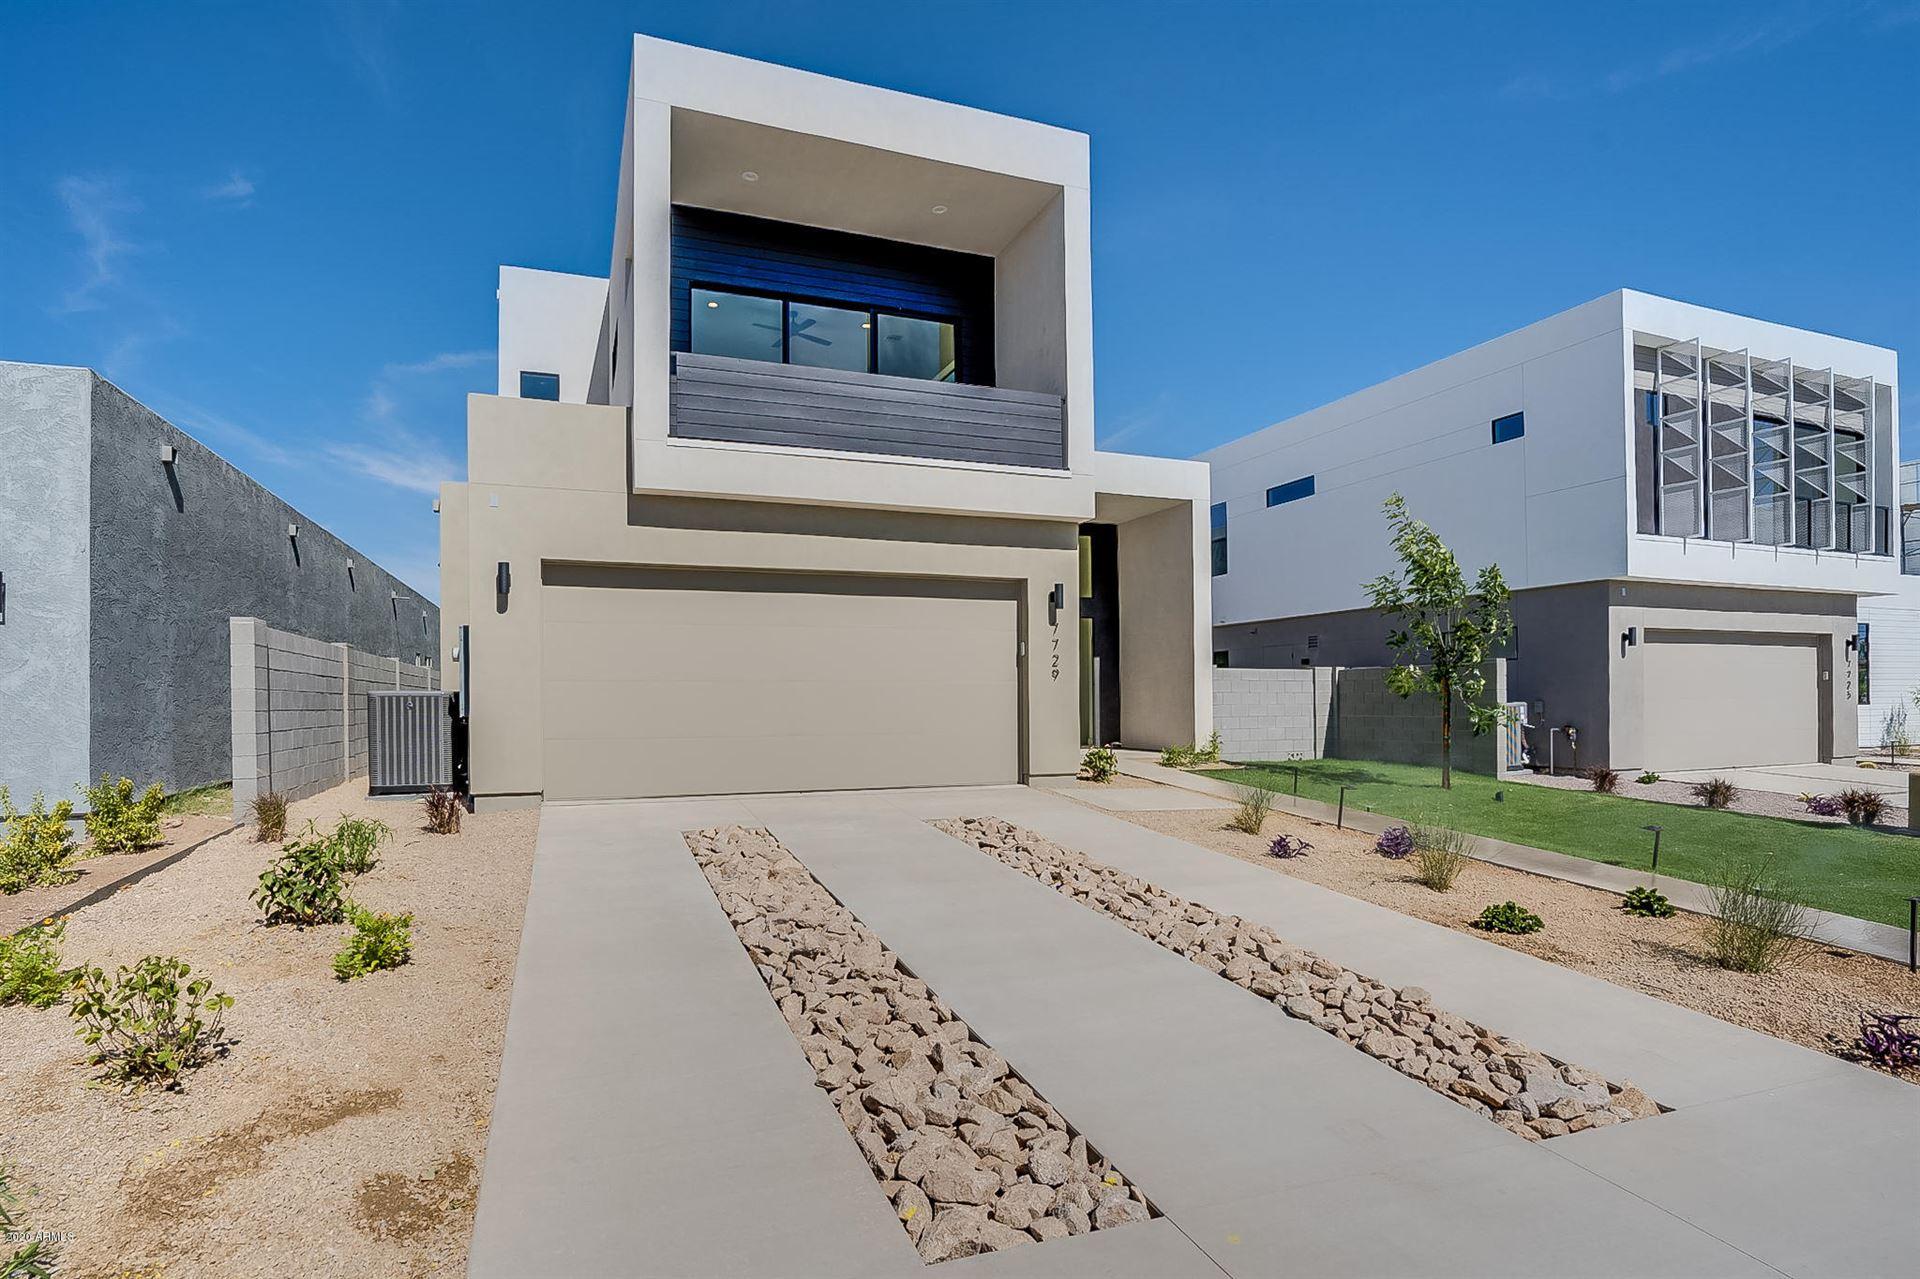 7729 N 13TH Place, Phoenix, AZ 85020 - MLS#: 6063794